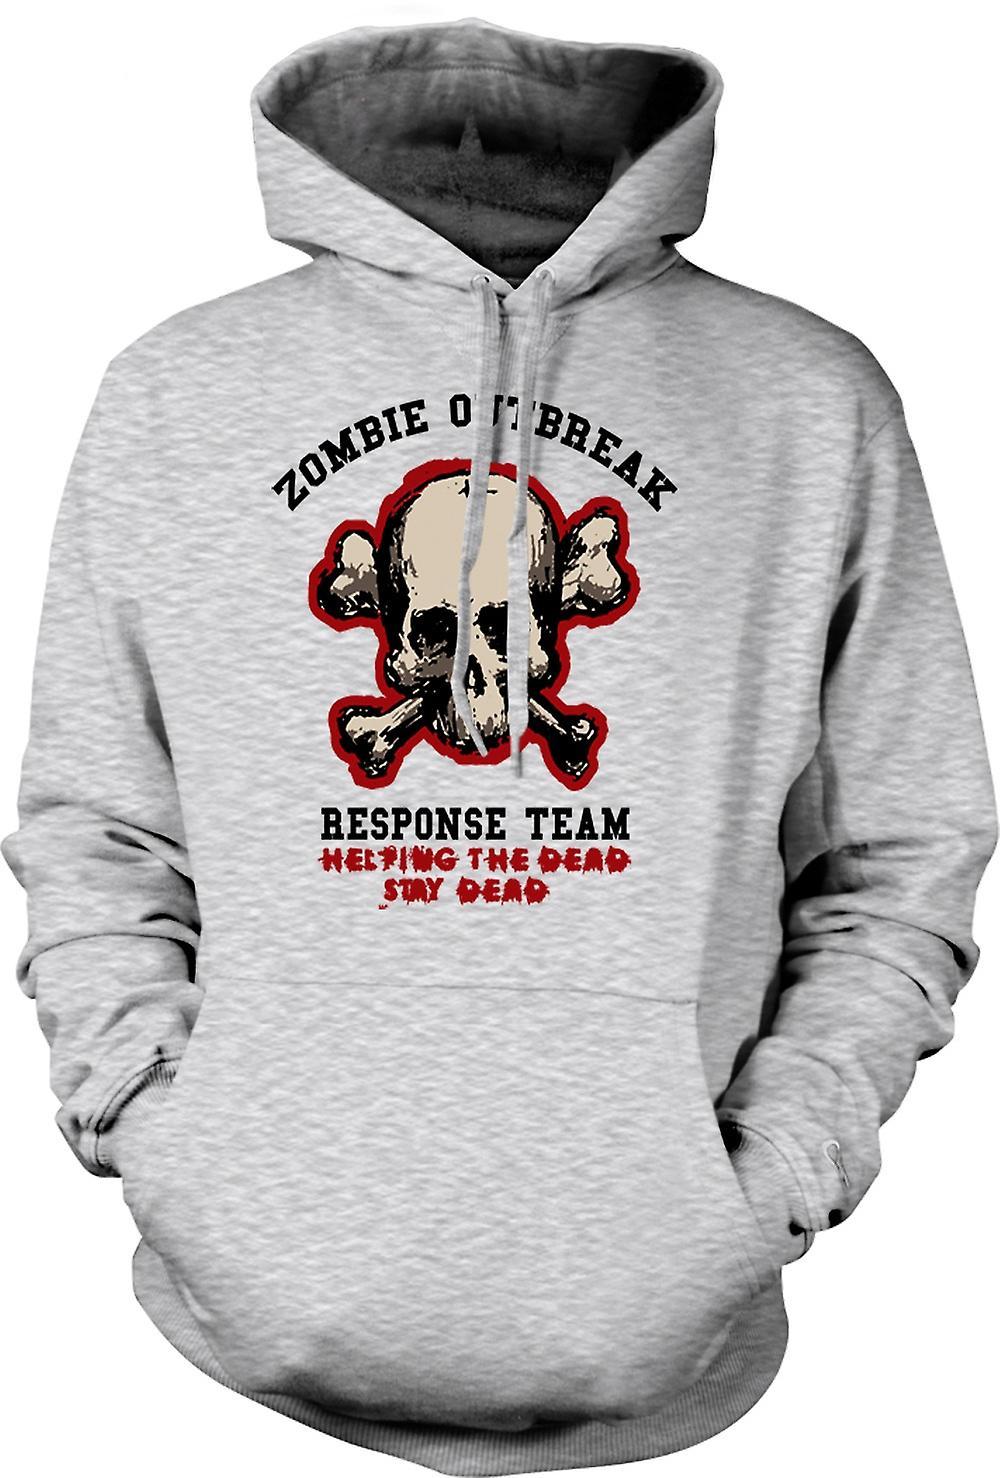 Mens Hoodie - Zombie Outbreak Response - Funny